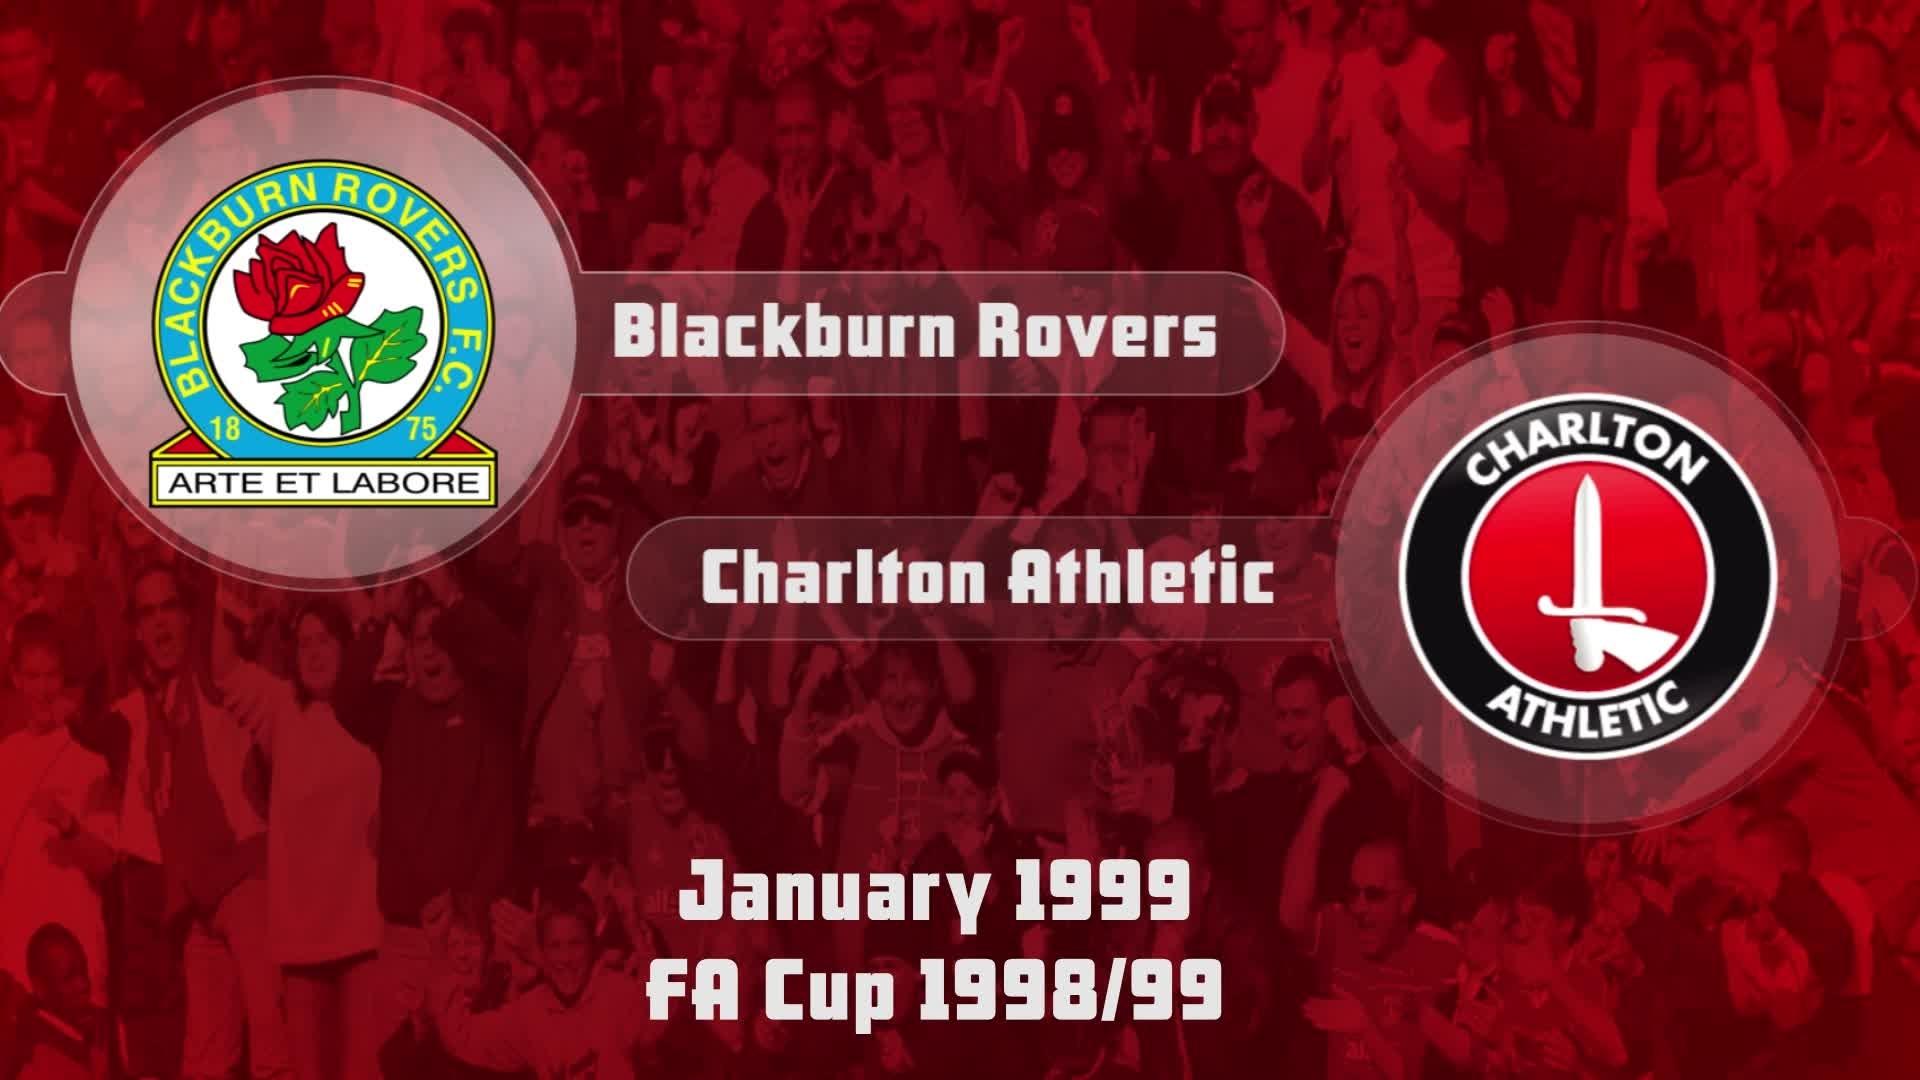 24 HIGHLIGHTS | Blackburn Rovers 2 Charlton 0 (FA Cup Jan 1999)